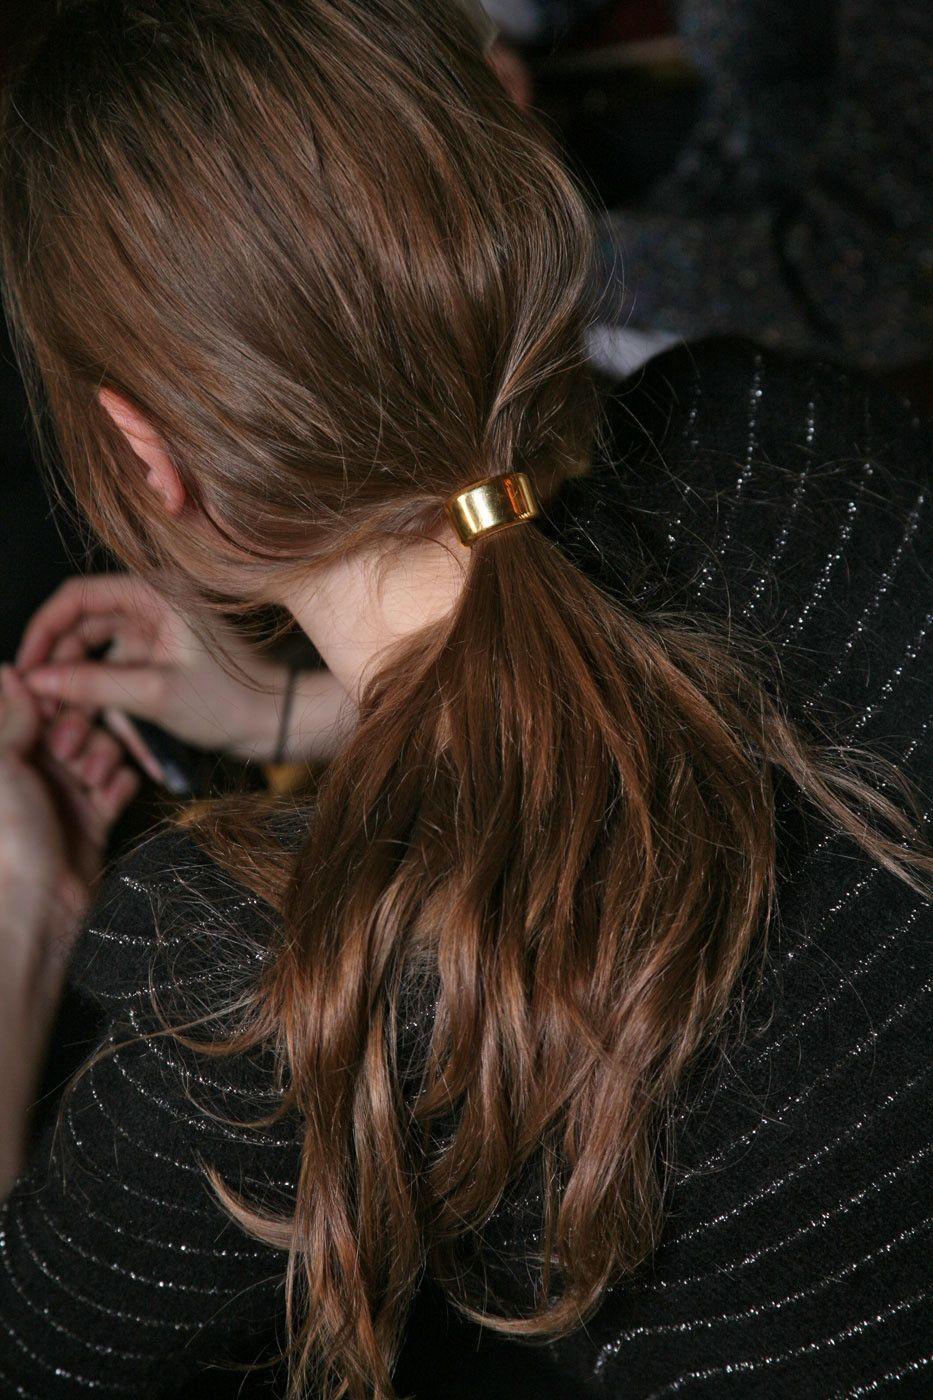 http://friedasophiejewelry.tumblr.com